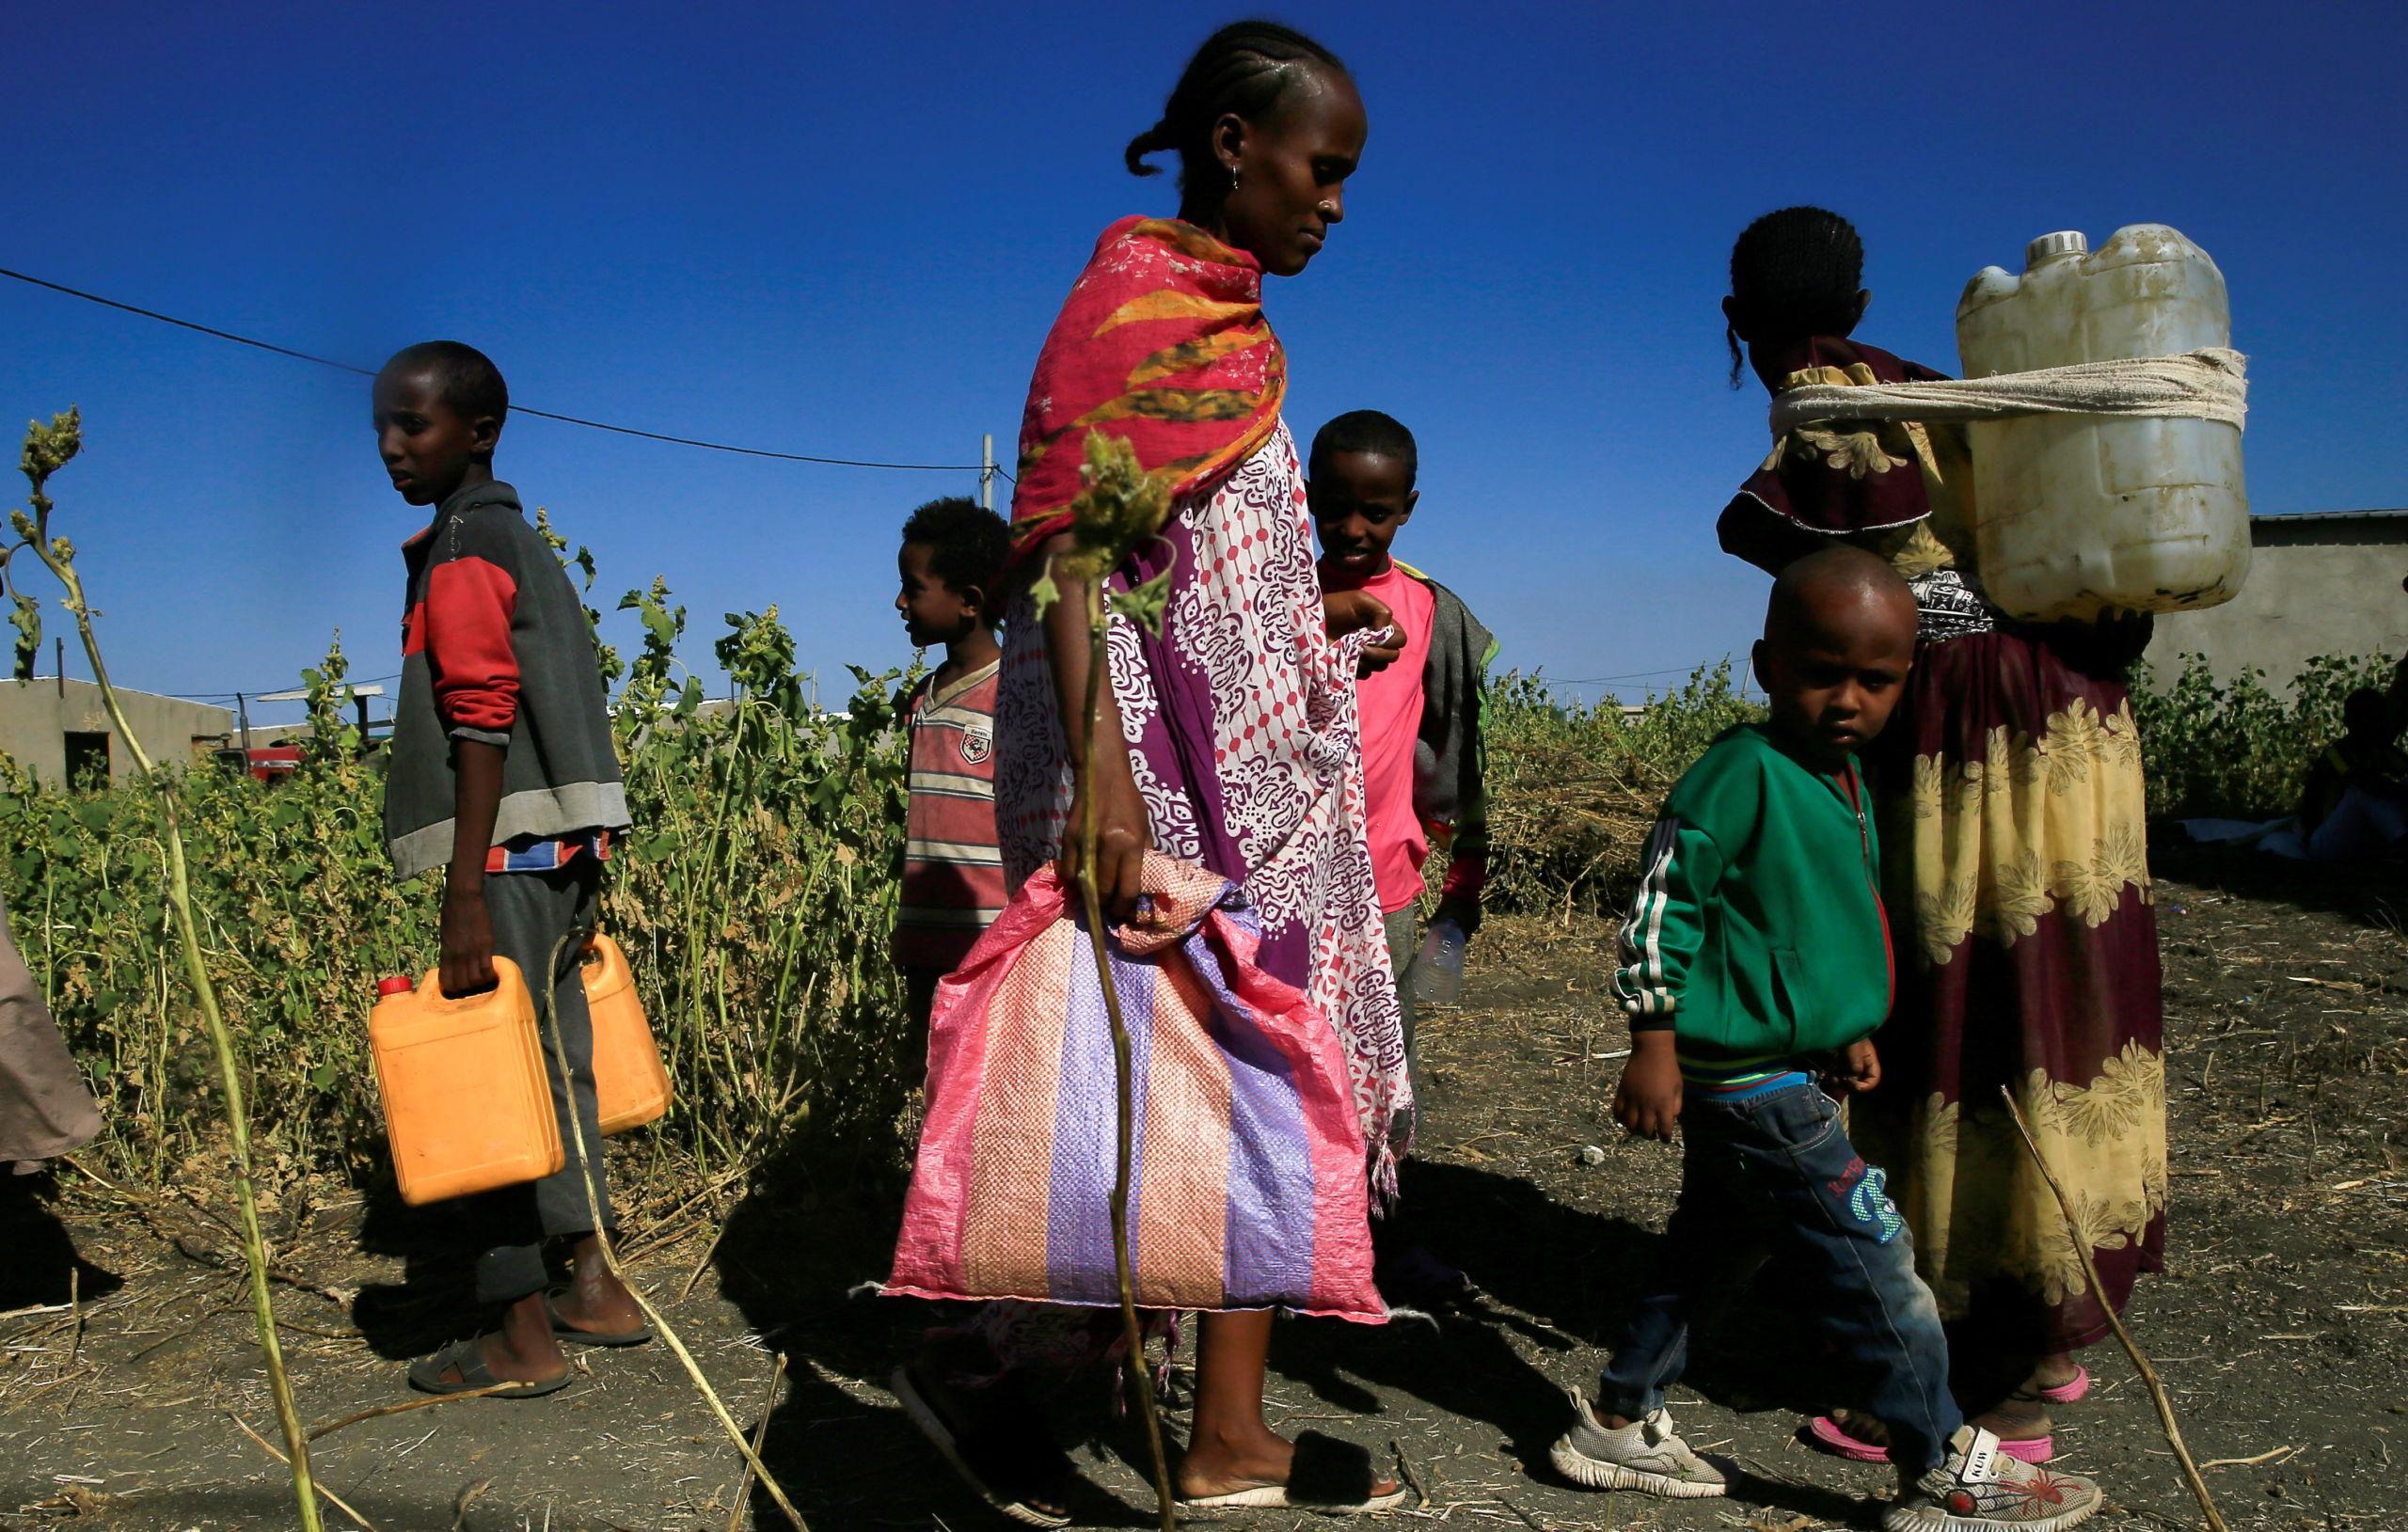 76,500 people were displaced in Afar and an estimated 200,000 in Amhara/Aljazeera.